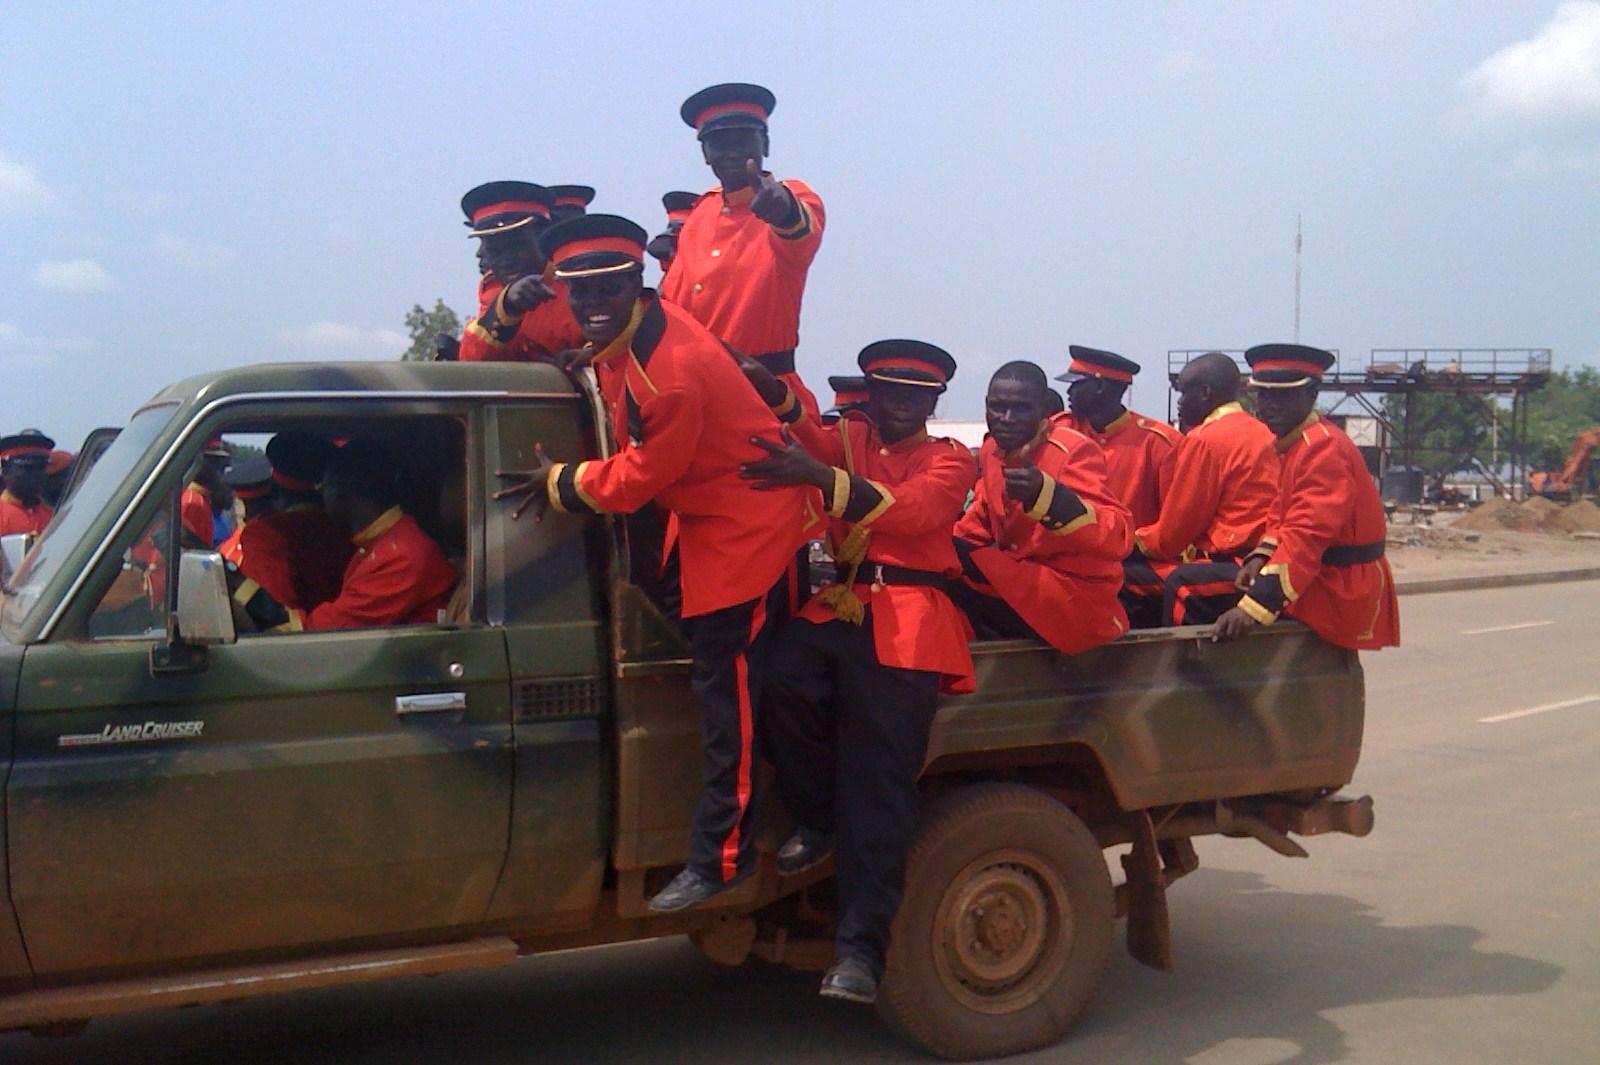 SPLA marching band